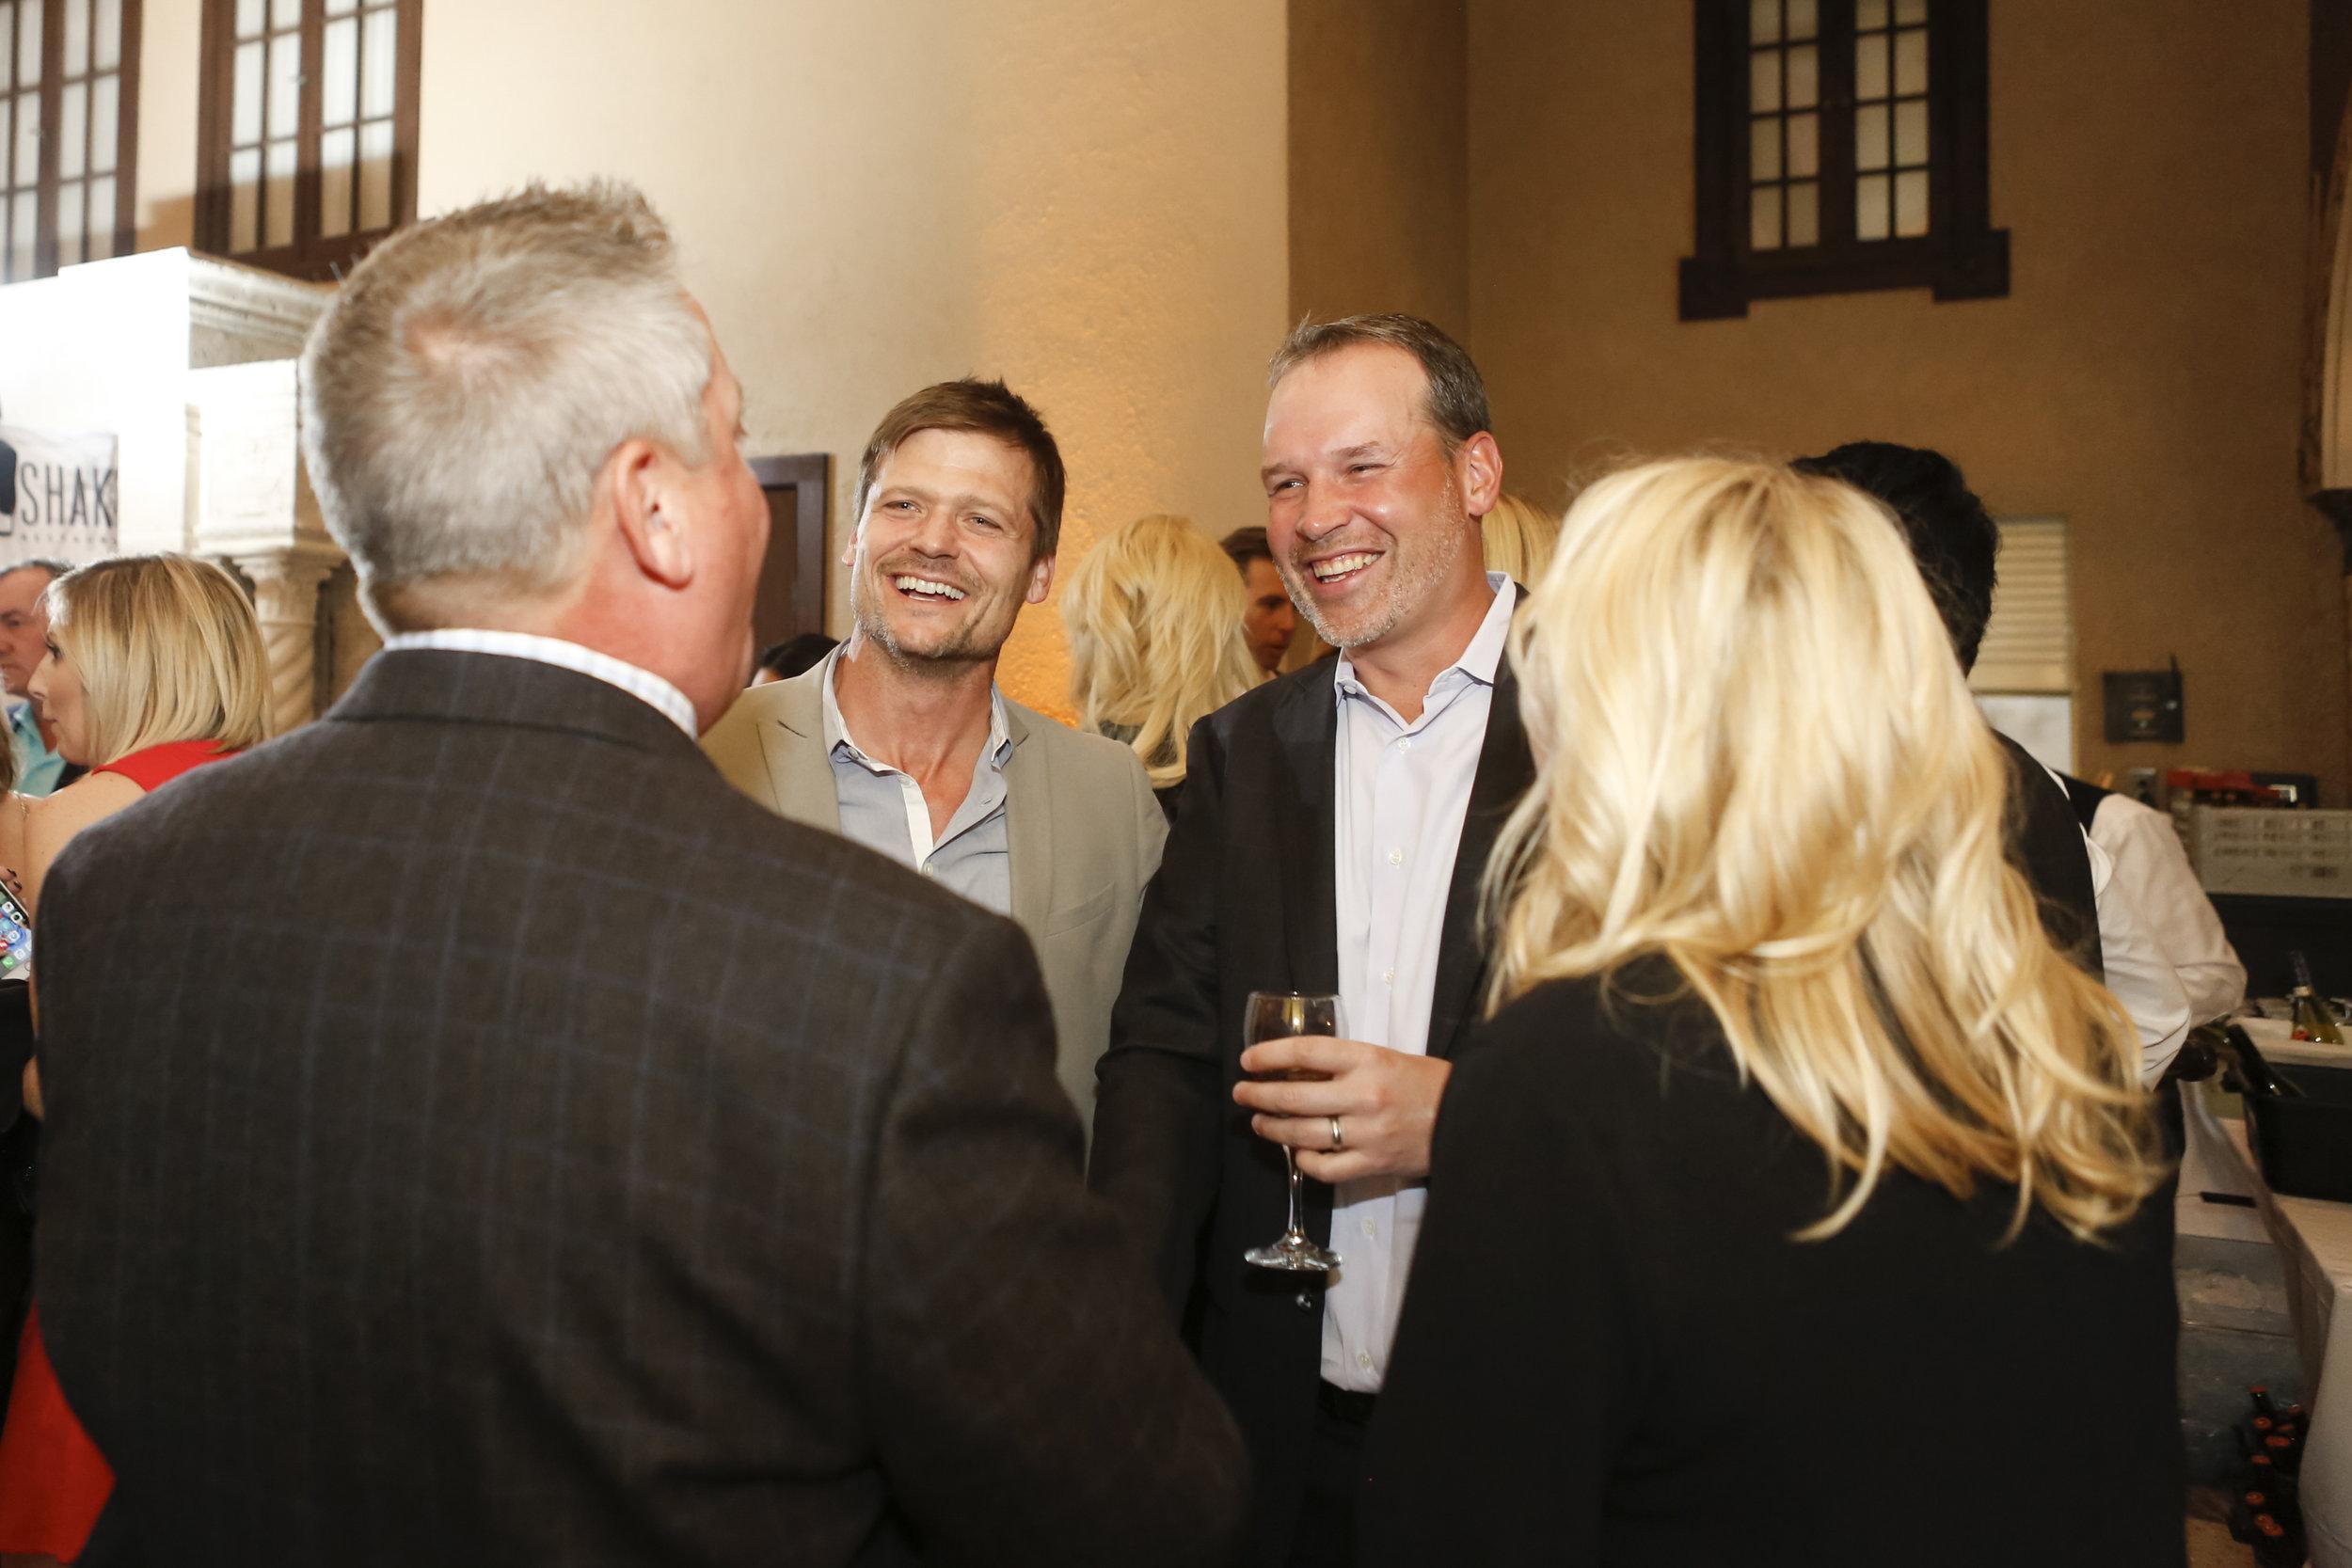 golf-give-gala-celebrity-michael-phelps-jason-day-event-photographer-madison-wi-4.jpg